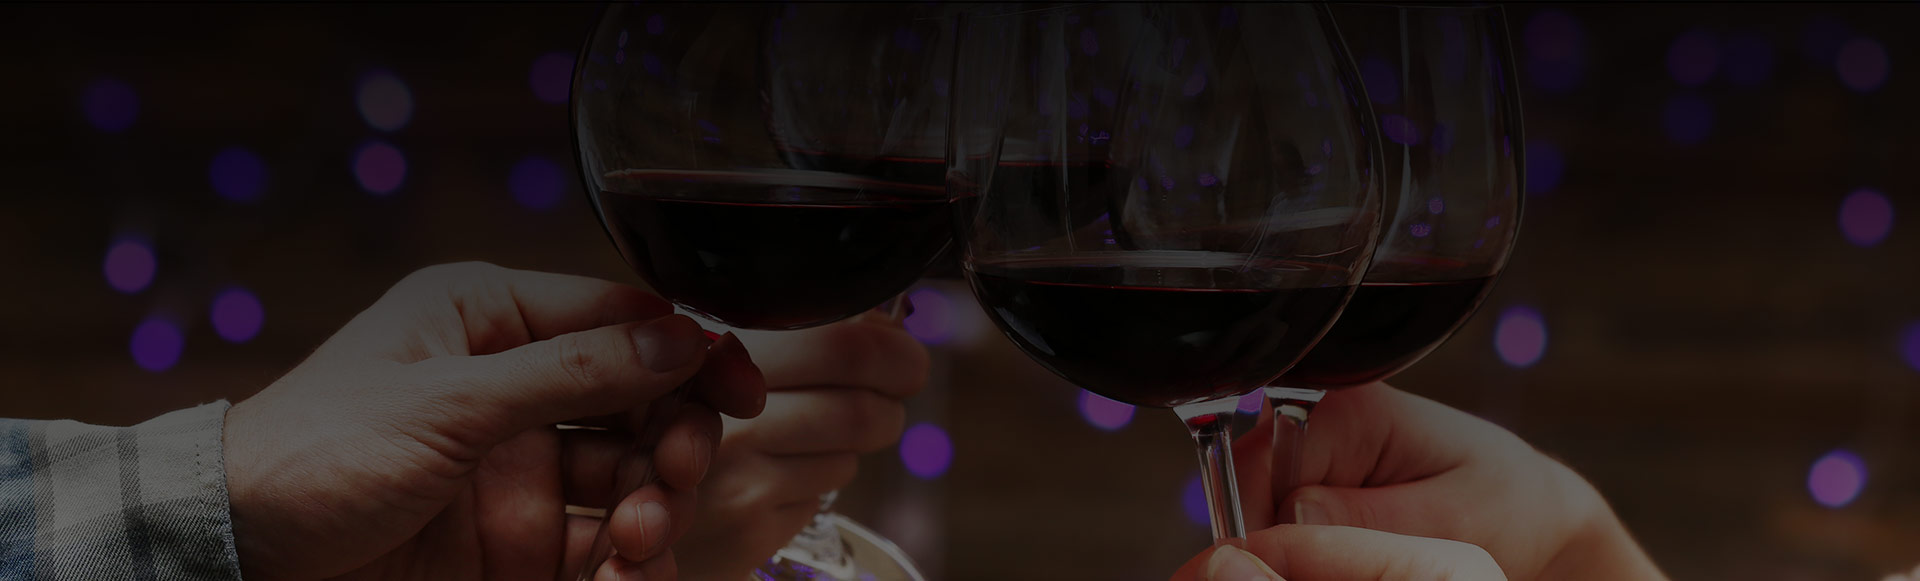 Vinos Bodega del Aguila en Toledo